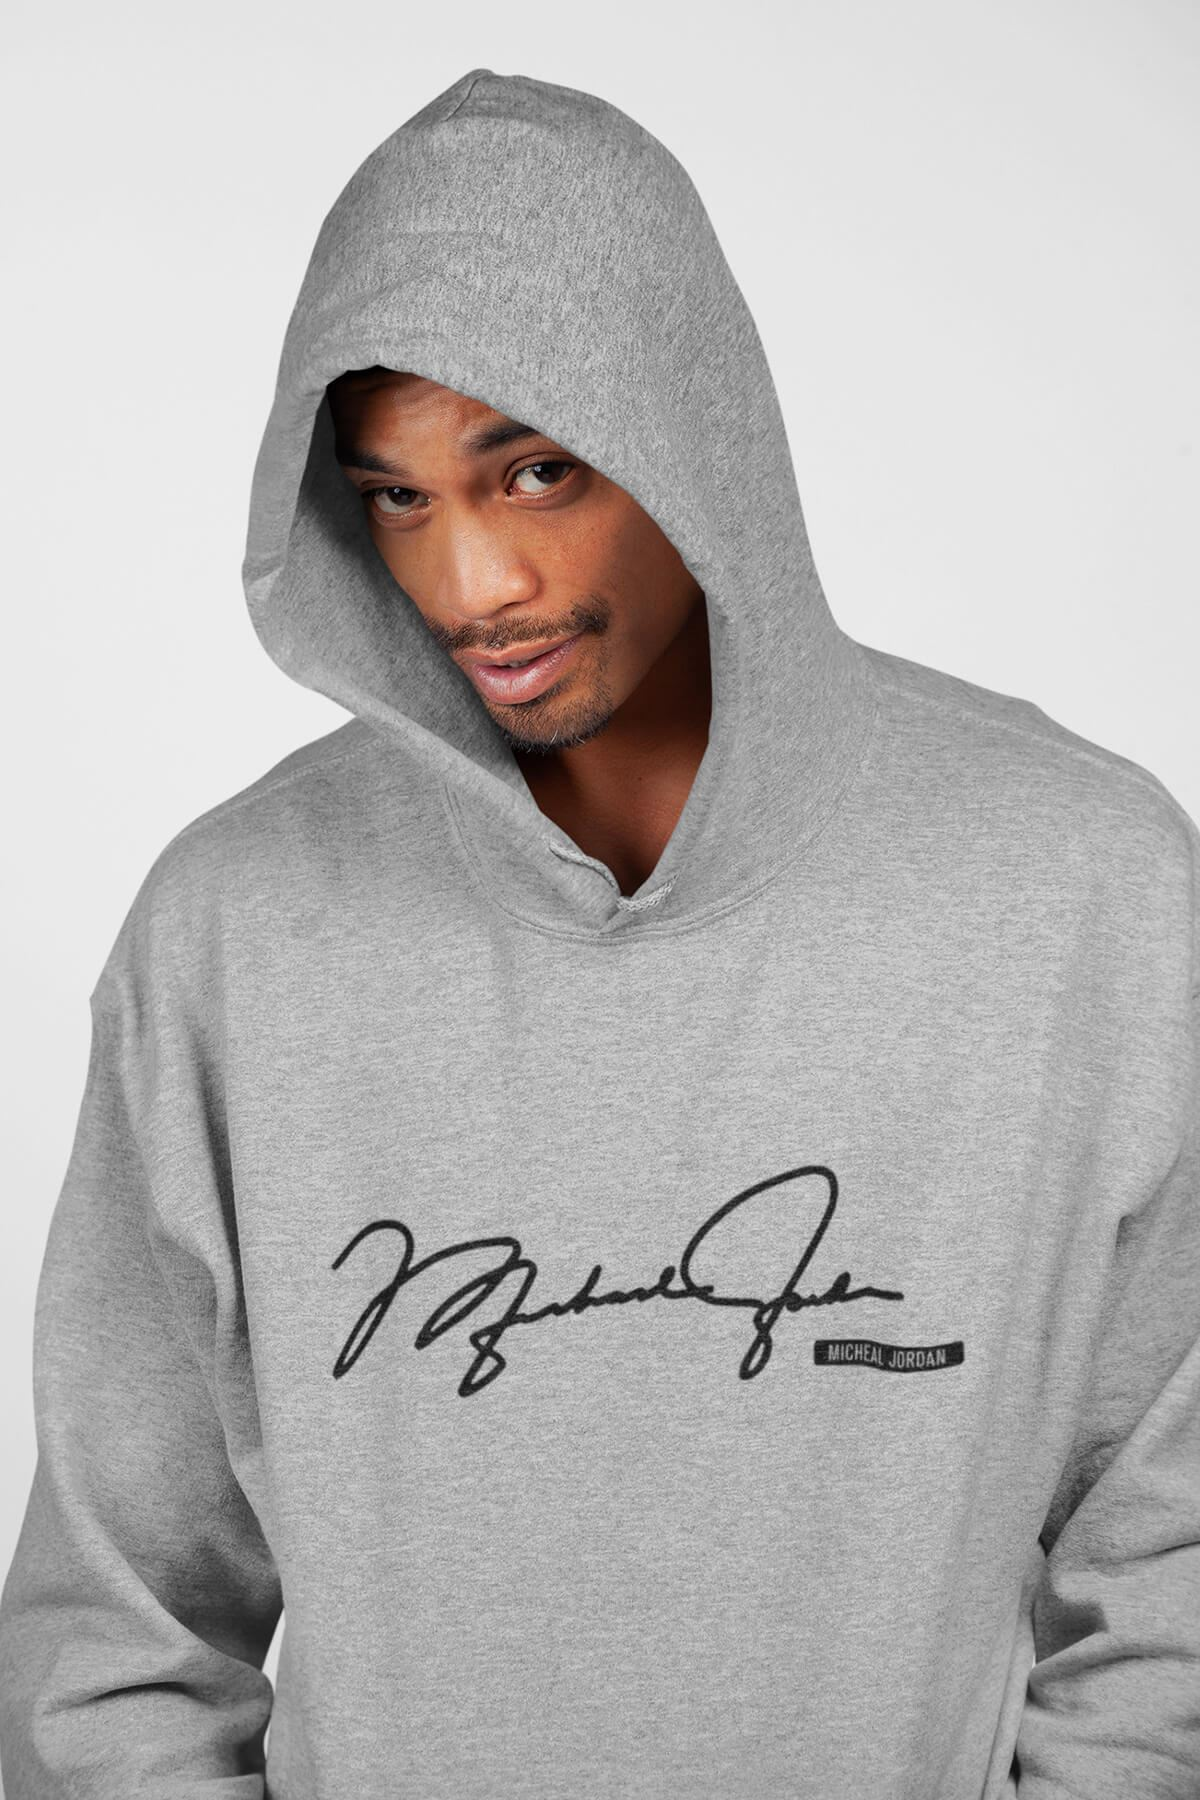 Basketbol İmza Gri Erkek Kapşonlu Sweatshirt - Hoodie